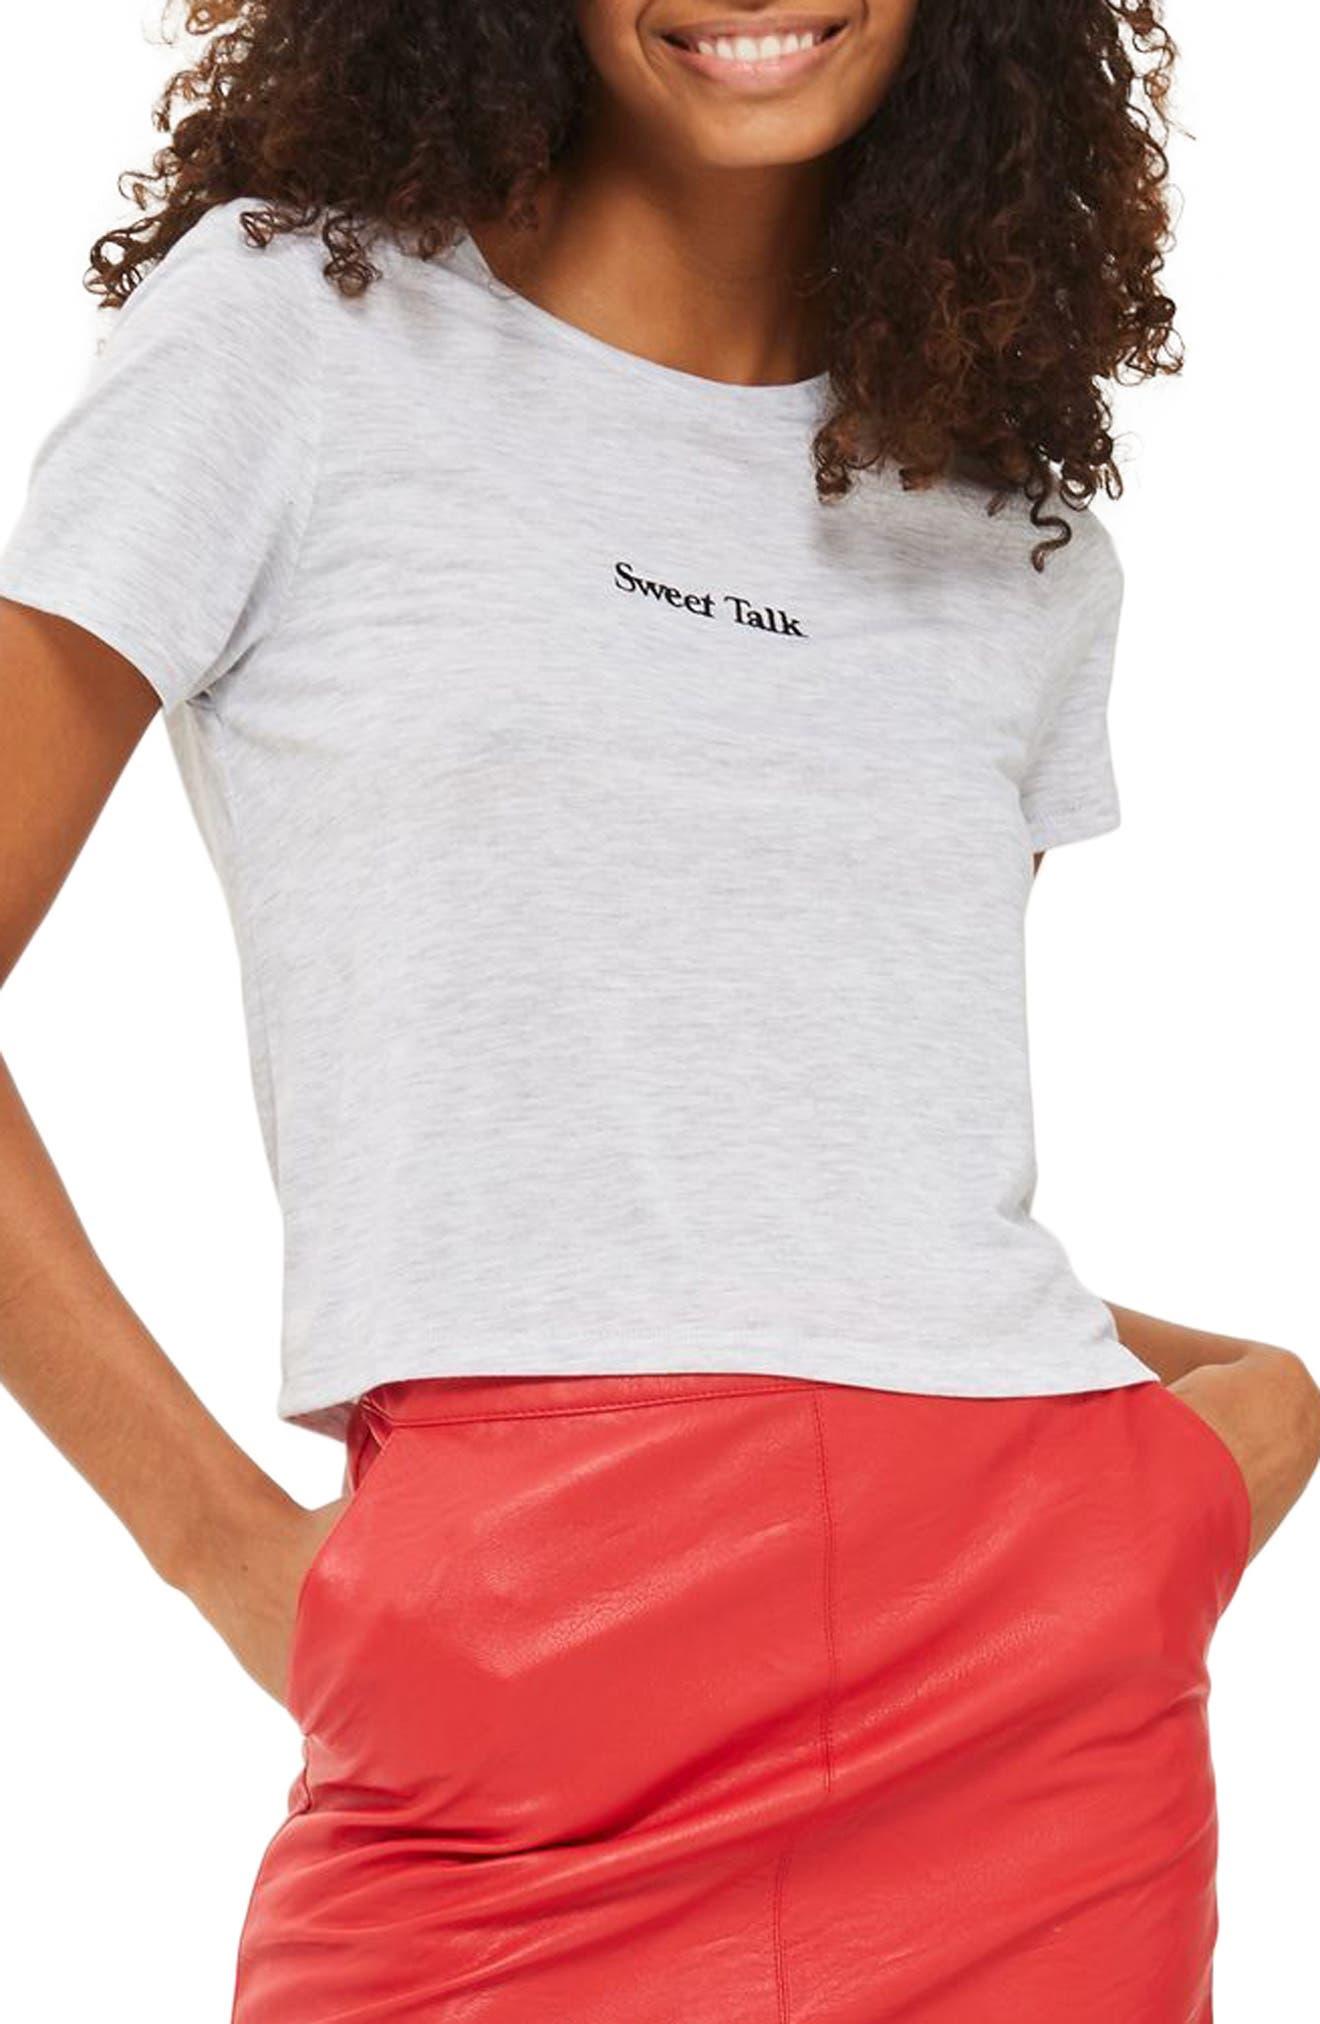 Topshop Sweet Talk Tee (Regular & Petite)